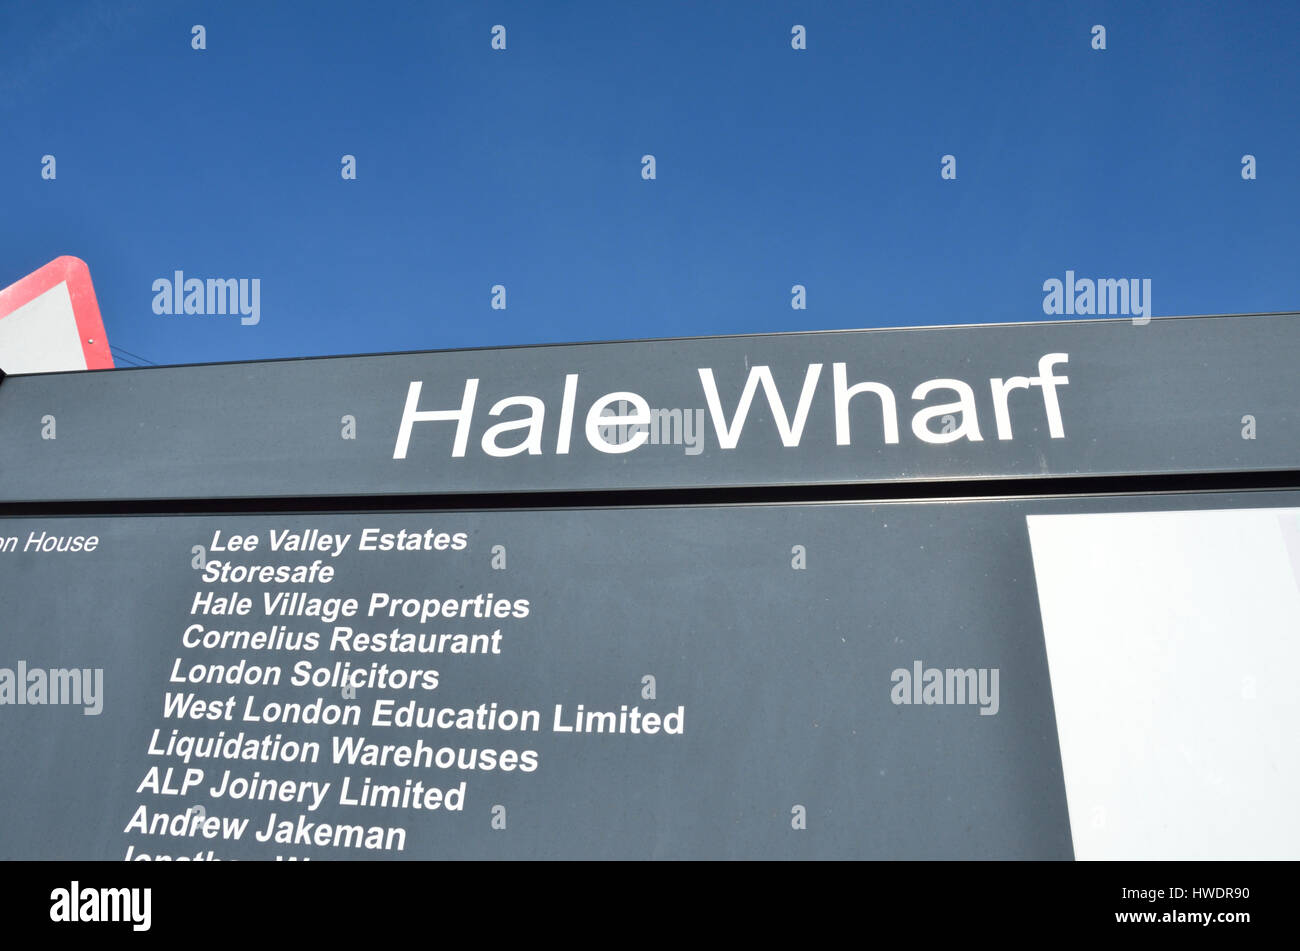 Hale Wharf sign, Tottenham Hale, London, UK. - Stock Image